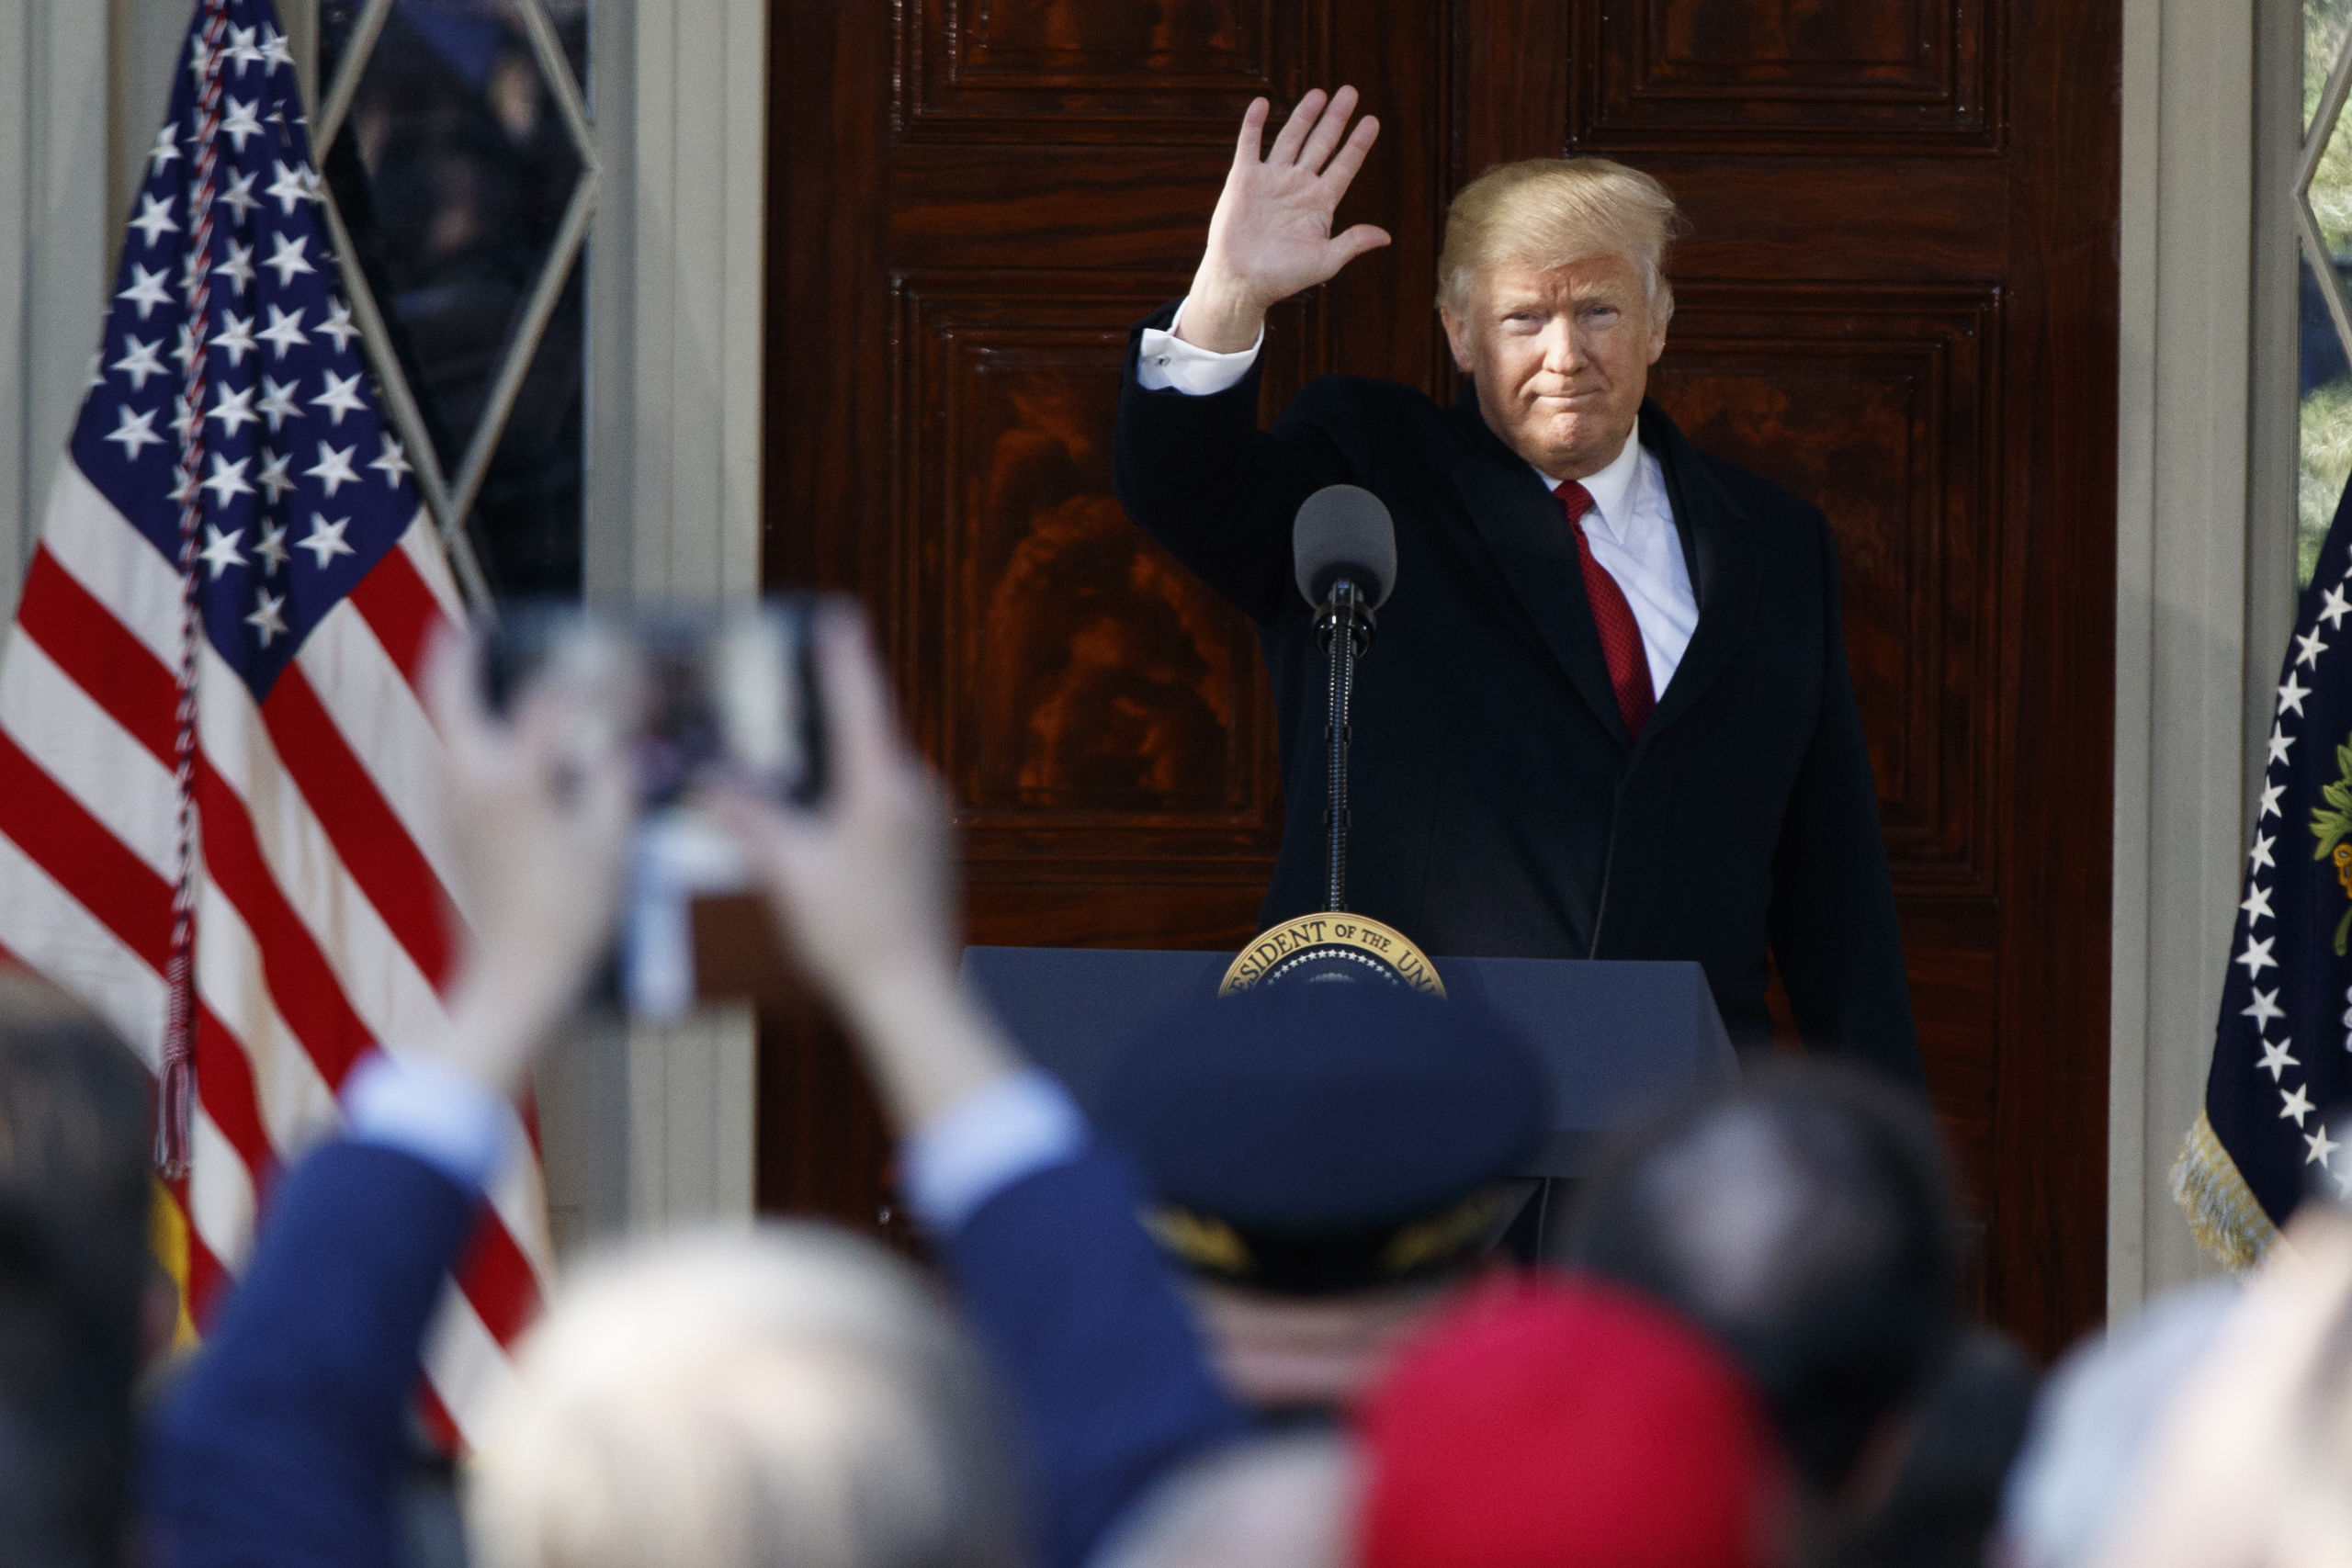 Trump rasar over stoppat inreseforbud